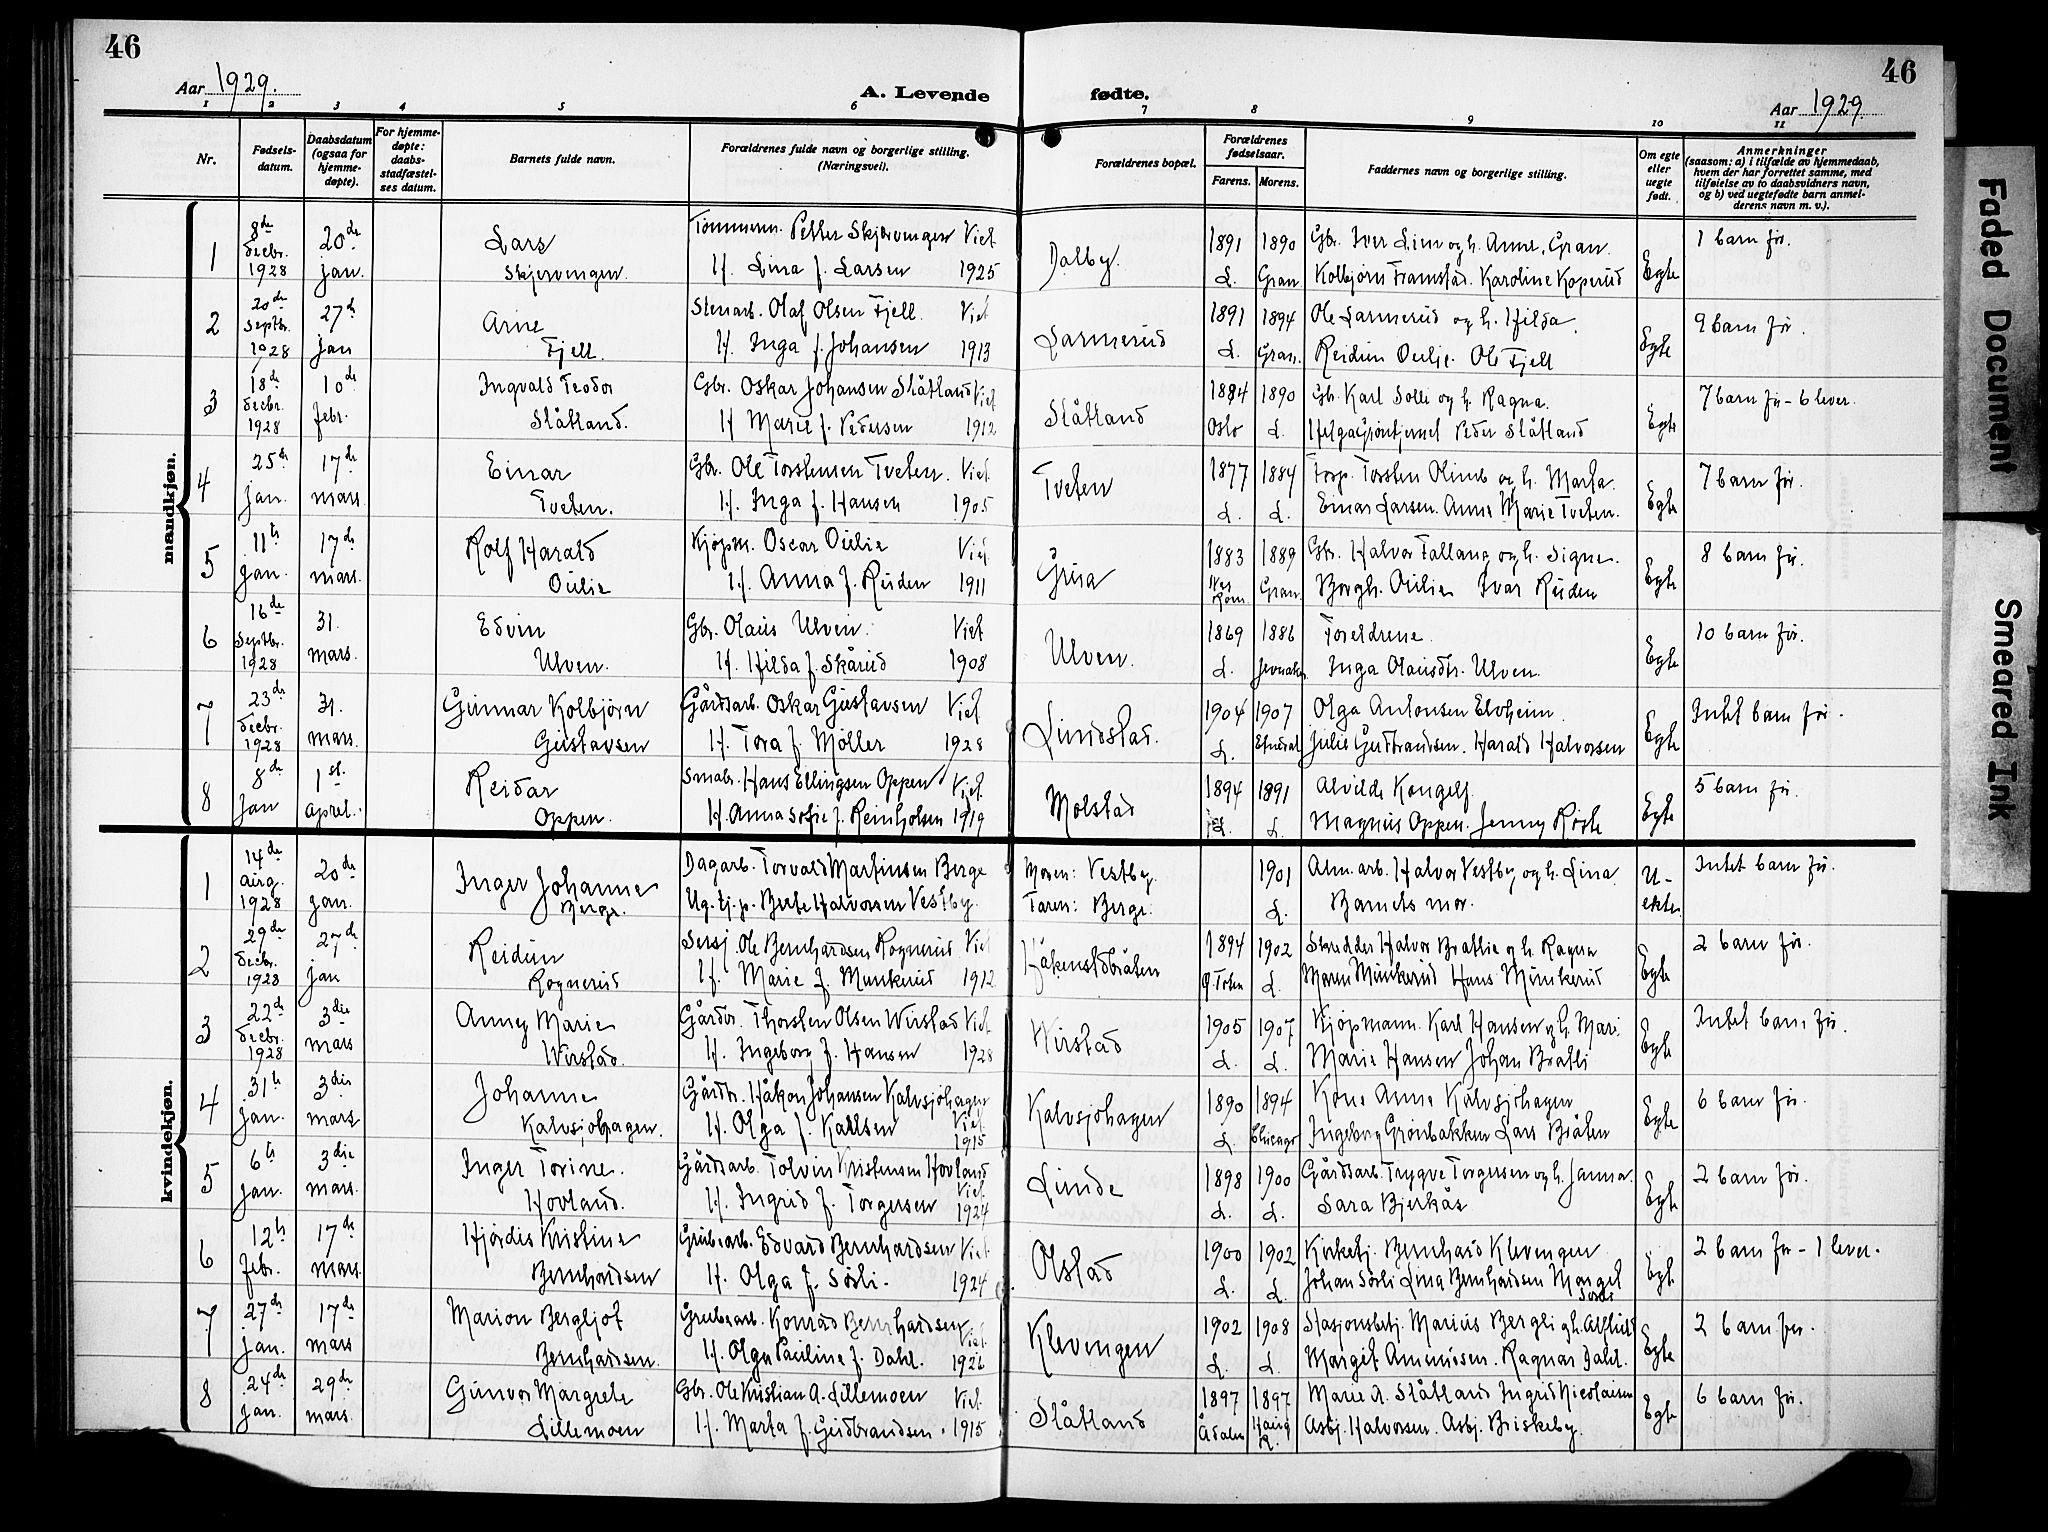 SAH, Lunner prestekontor, H/Ha/Hab/L0002: Klokkerbok nr. 2, 1923-1933, s. 46